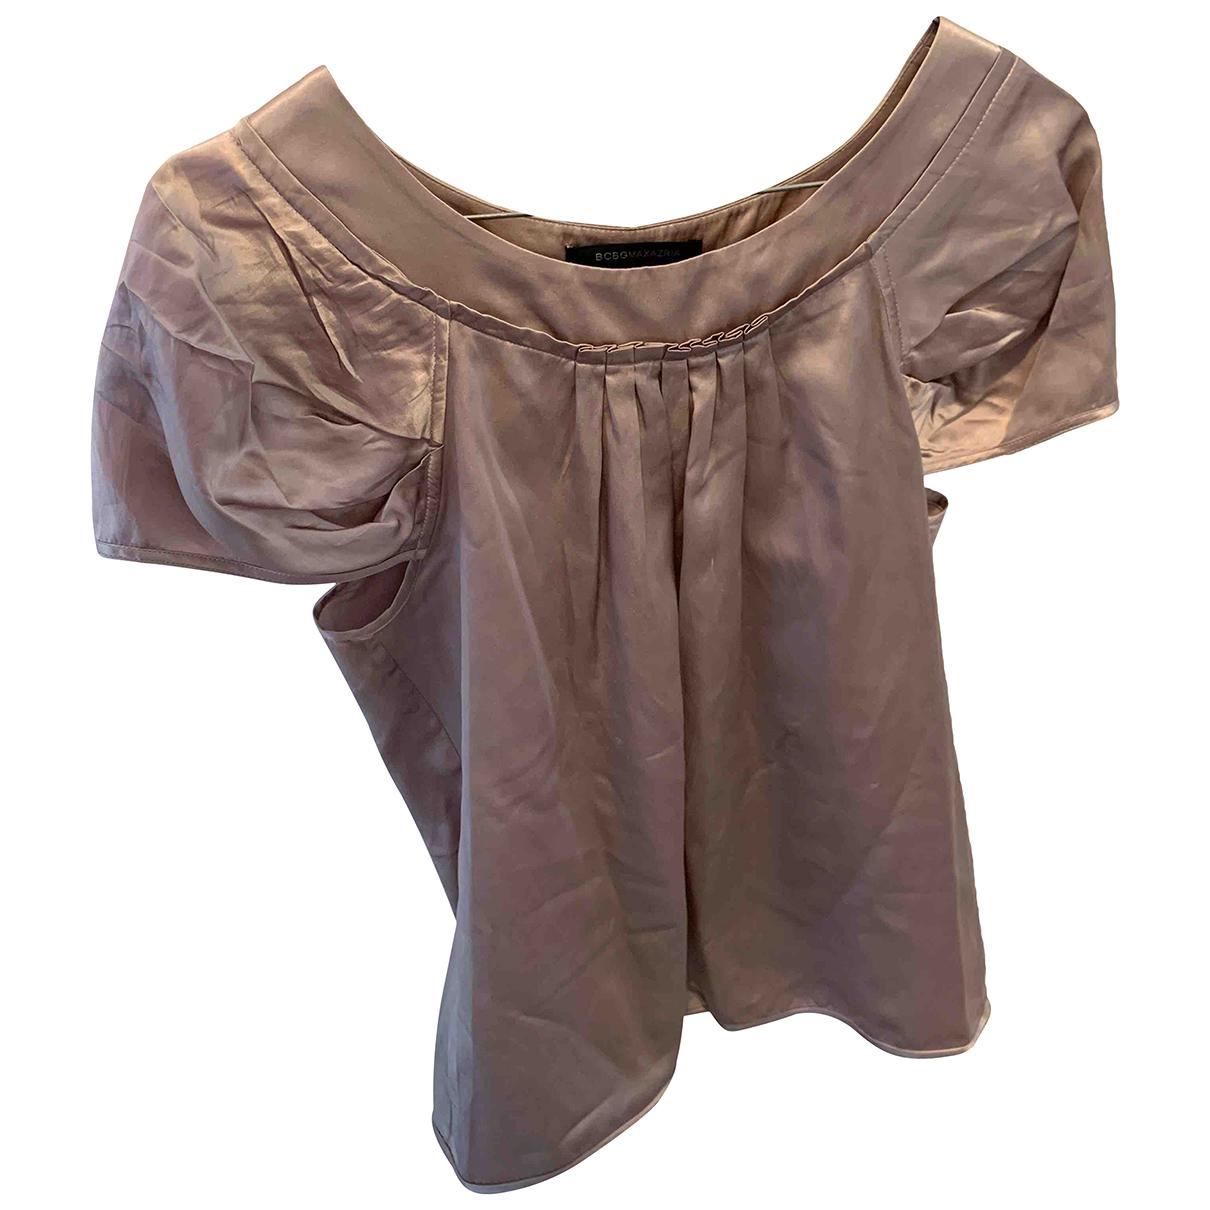 Bcbg Max Azria \N Pink Silk  top for Women XS International